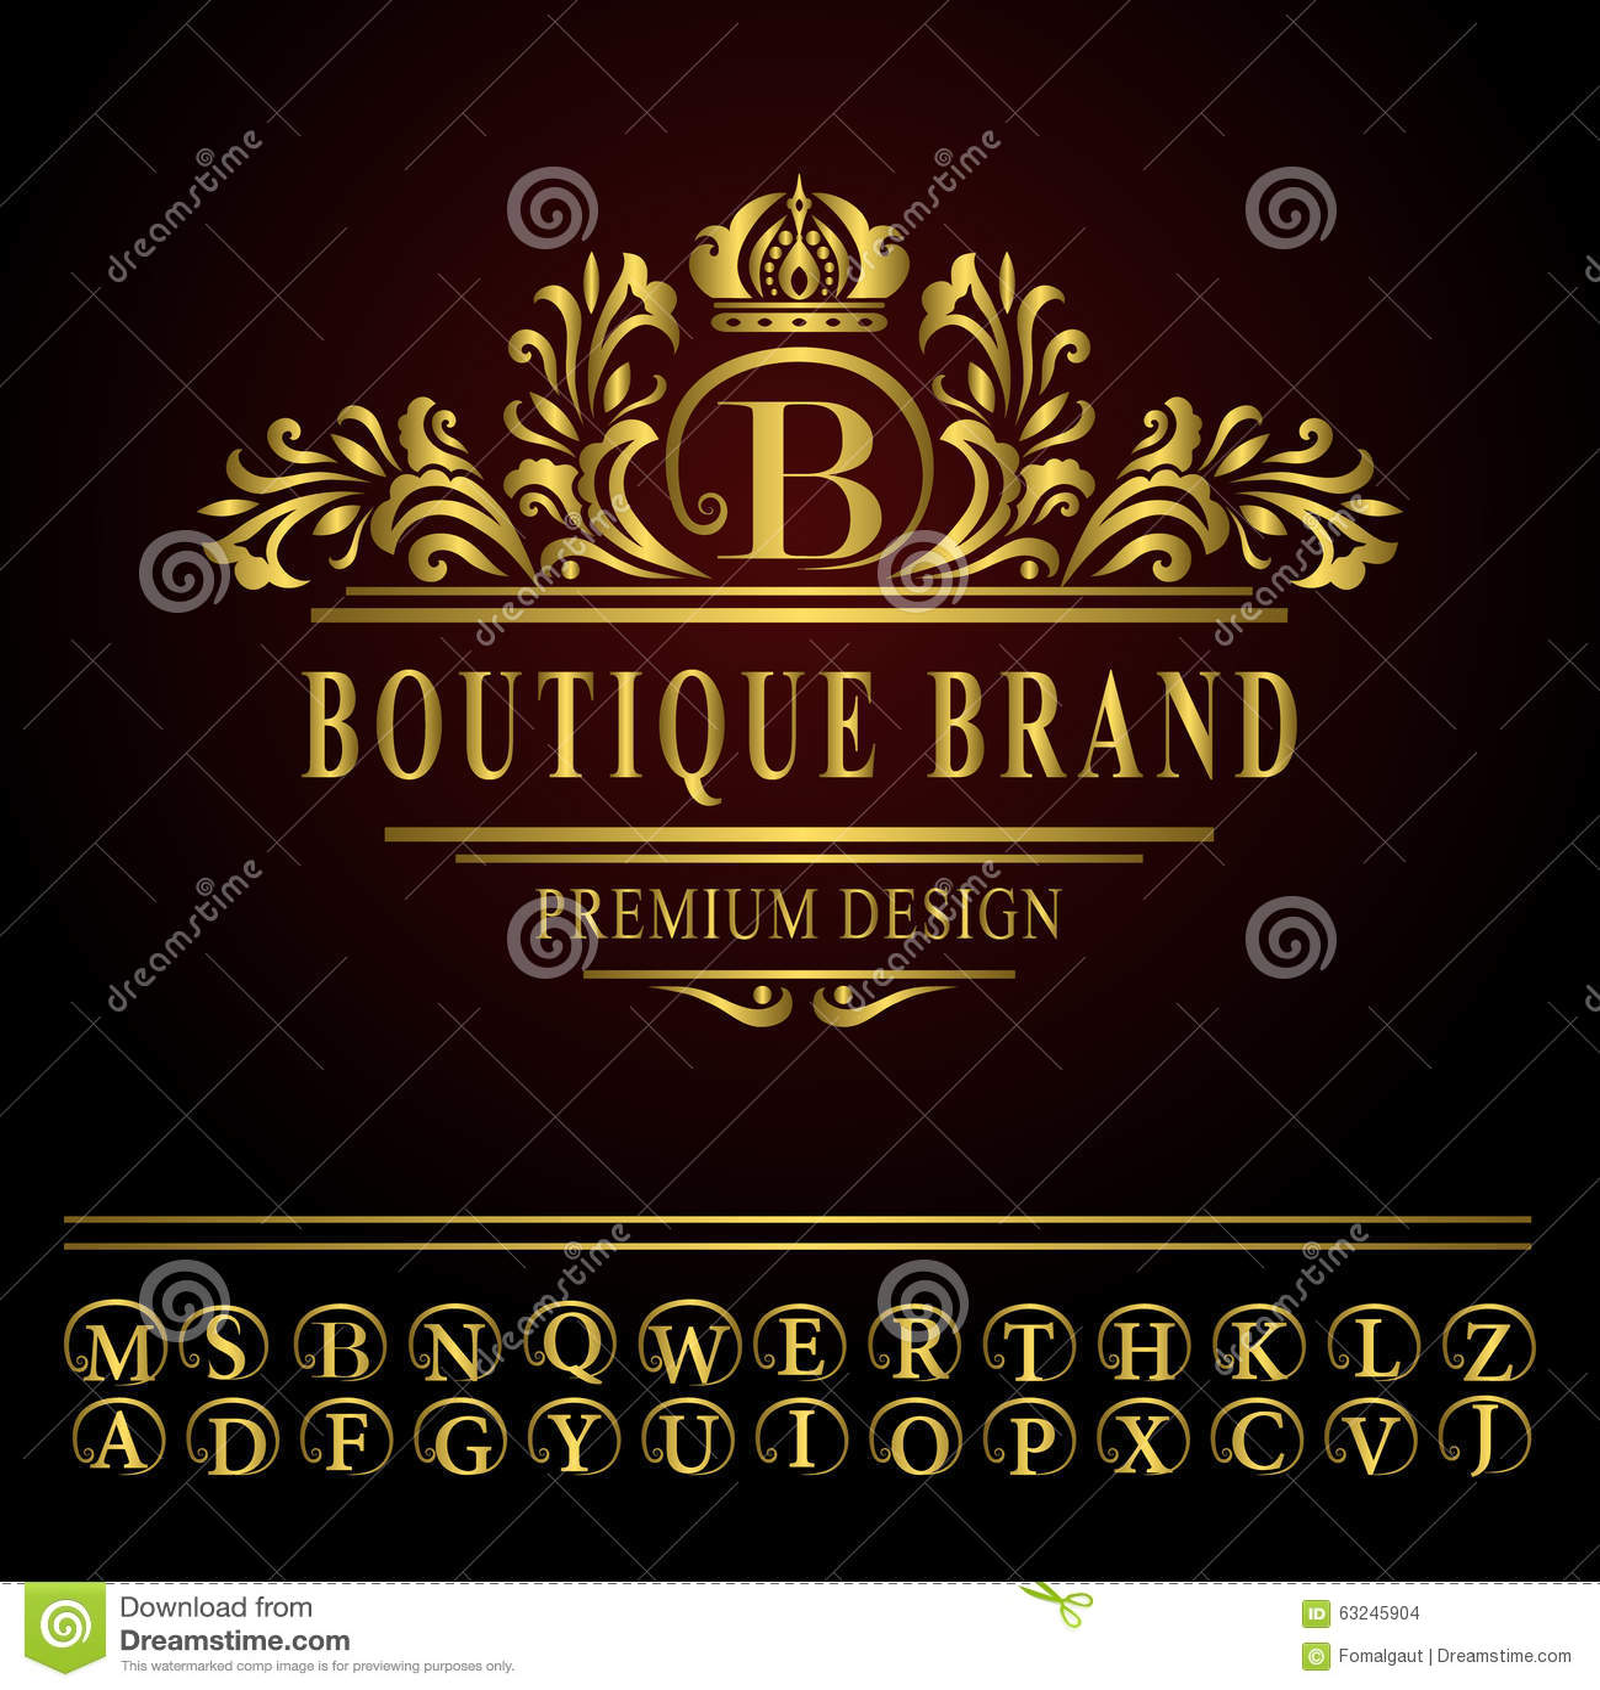 Monogram design elements, graceful template. Elegant line art logo design.